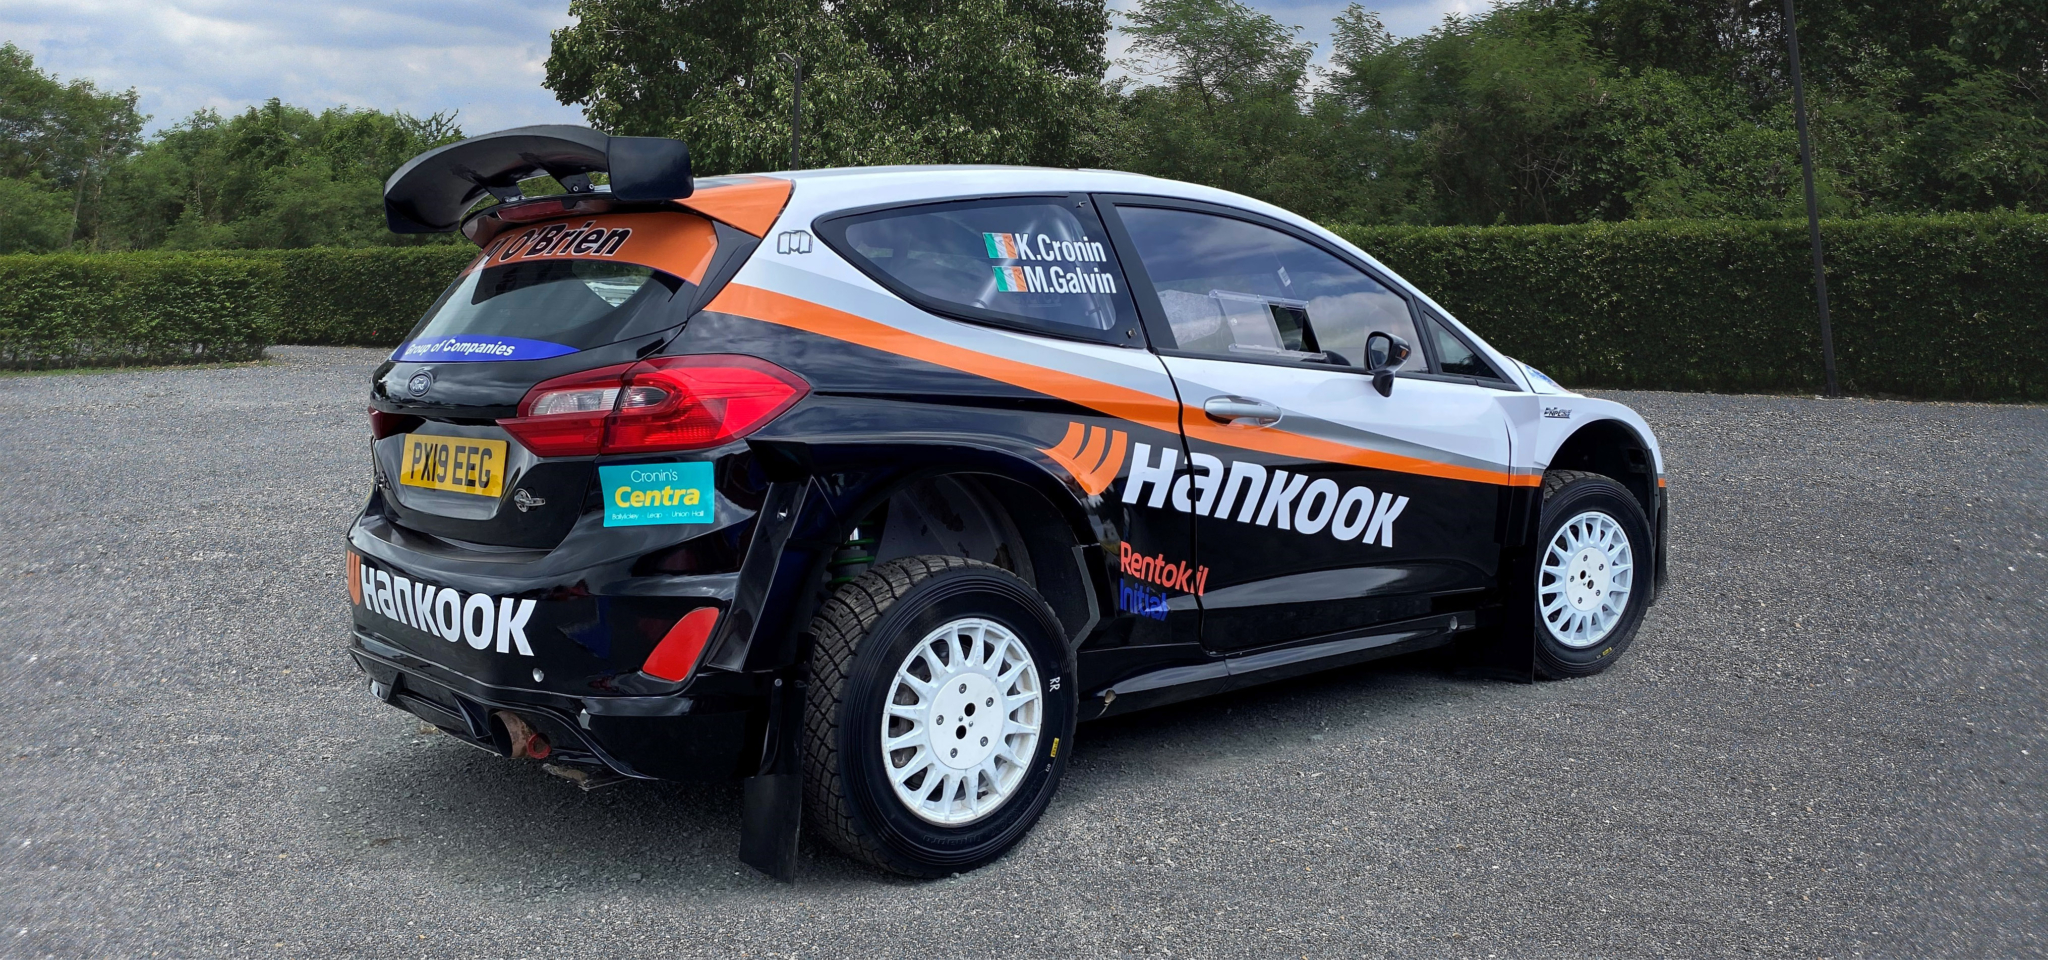 Hankook supports 4-time British Rally champion Cronin's 2021 return